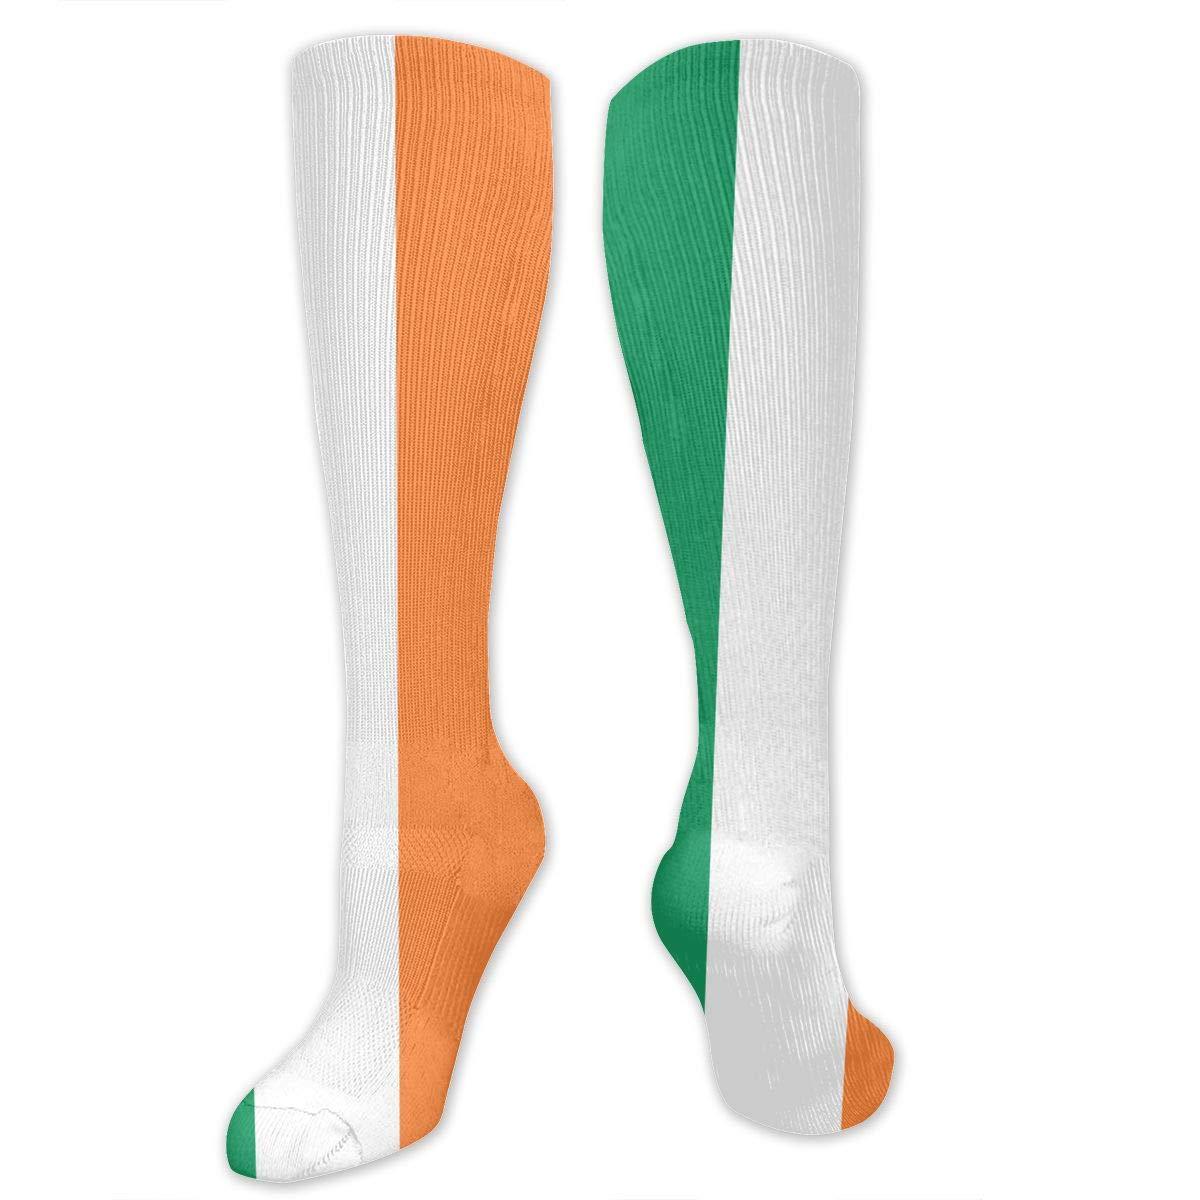 Unisex Irish Flag Knee High Compression Thigh High Socks Soft Socks